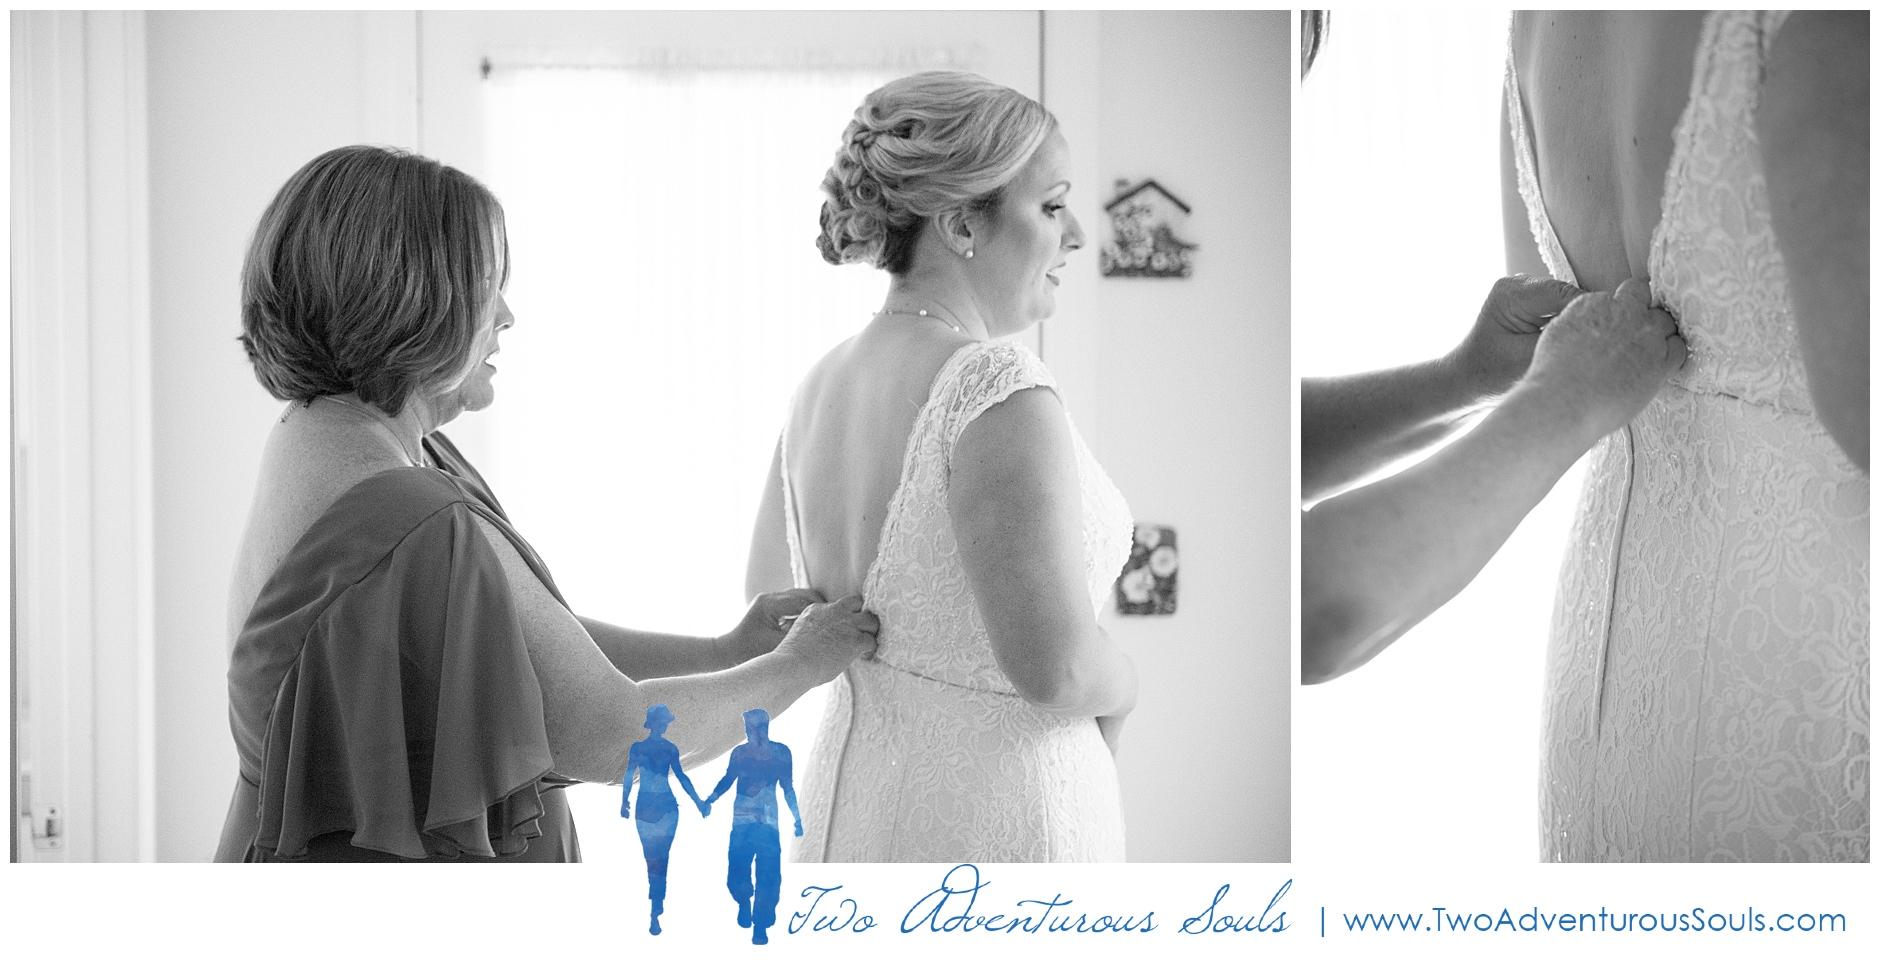 Cape Cod Wedding Photographers, Destination Wedding Photographers, Two Adventurous Souls-081019_0009.jpg